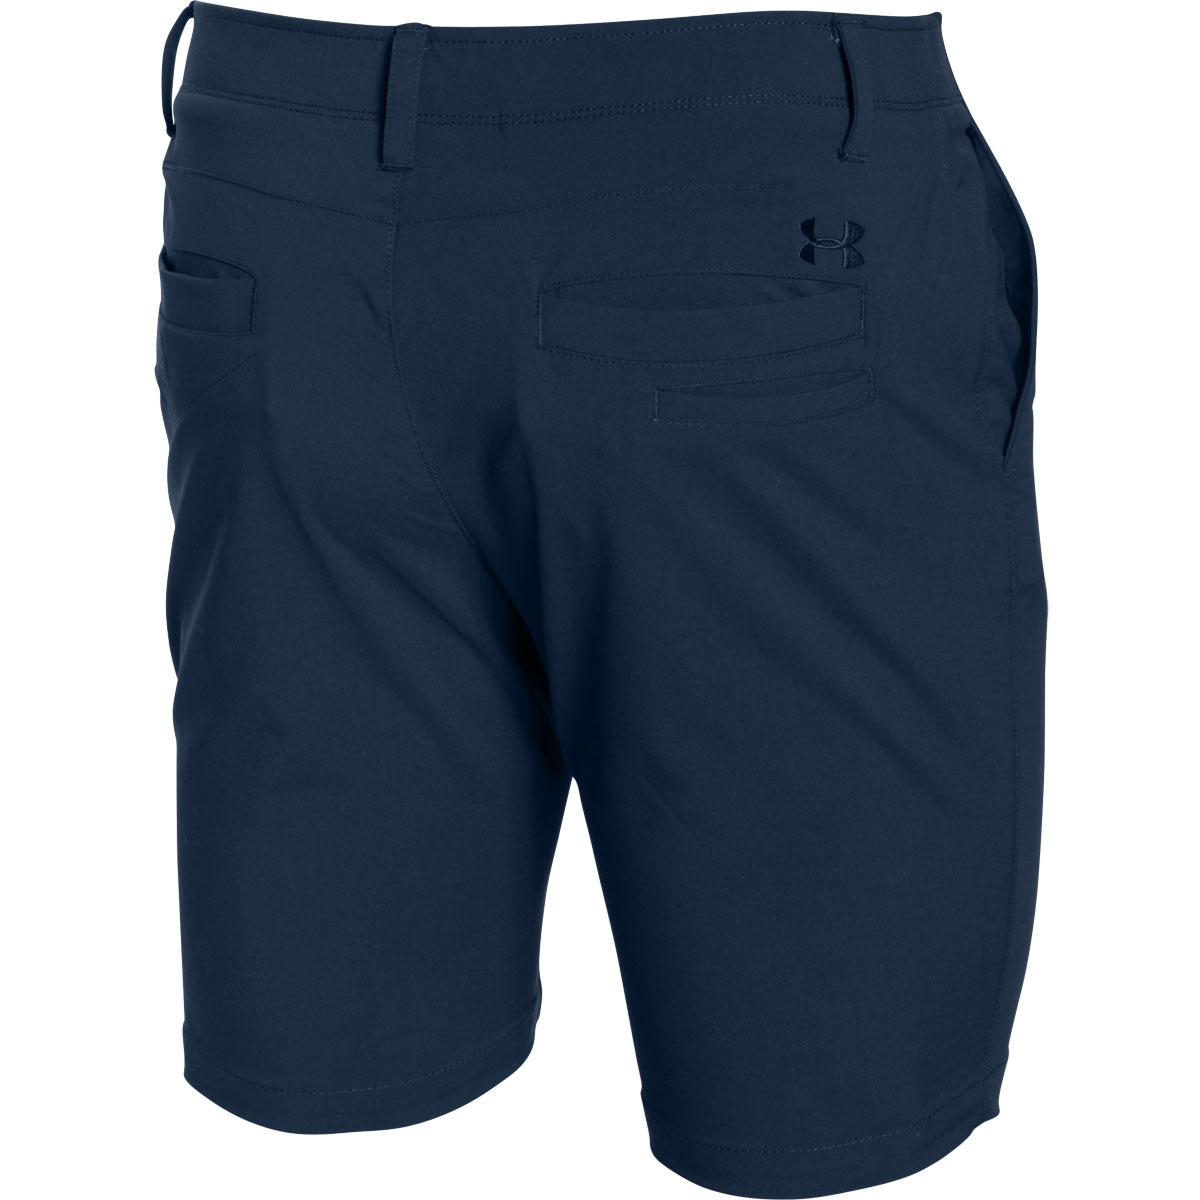 Under-Armour-Mens-UA-Match-Play-Taper-Tech-Performance-Summer-Golf-Shorts thumbnail 3